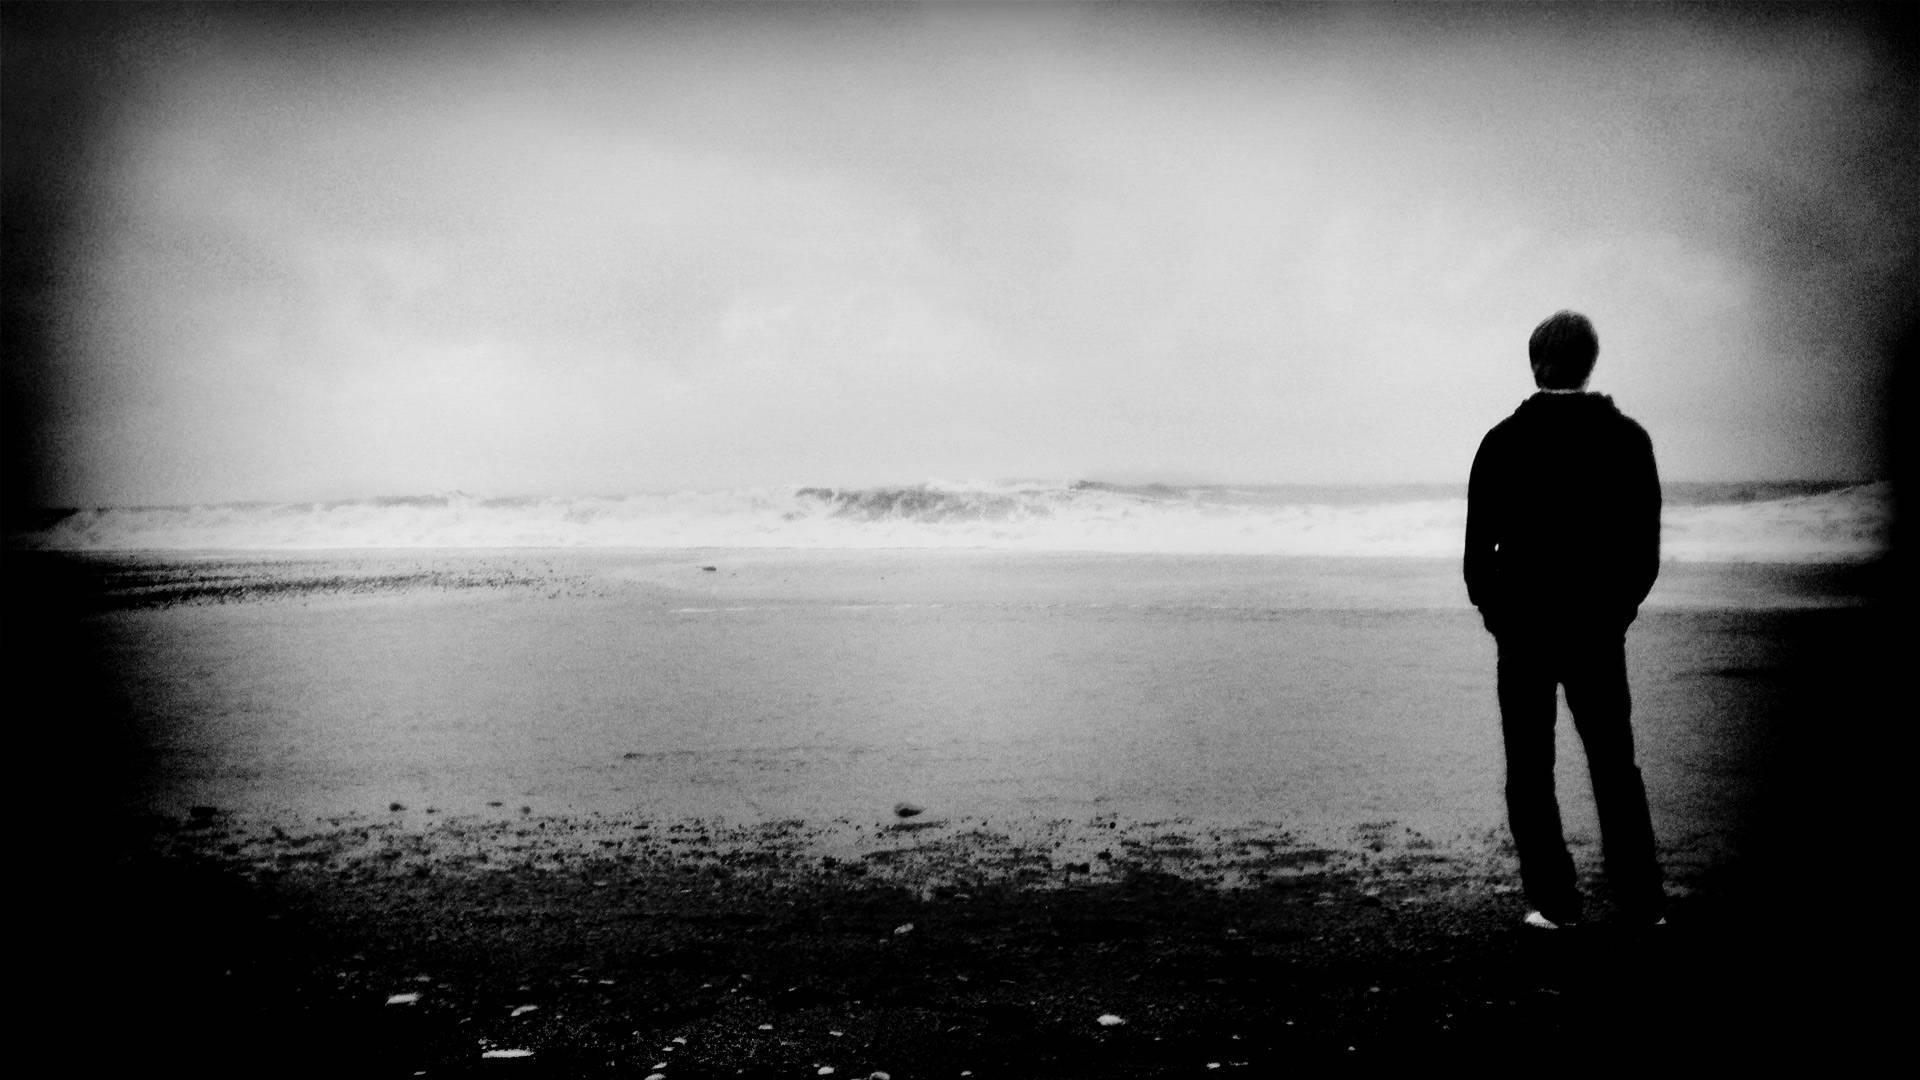 Картинки до слез про одиночество